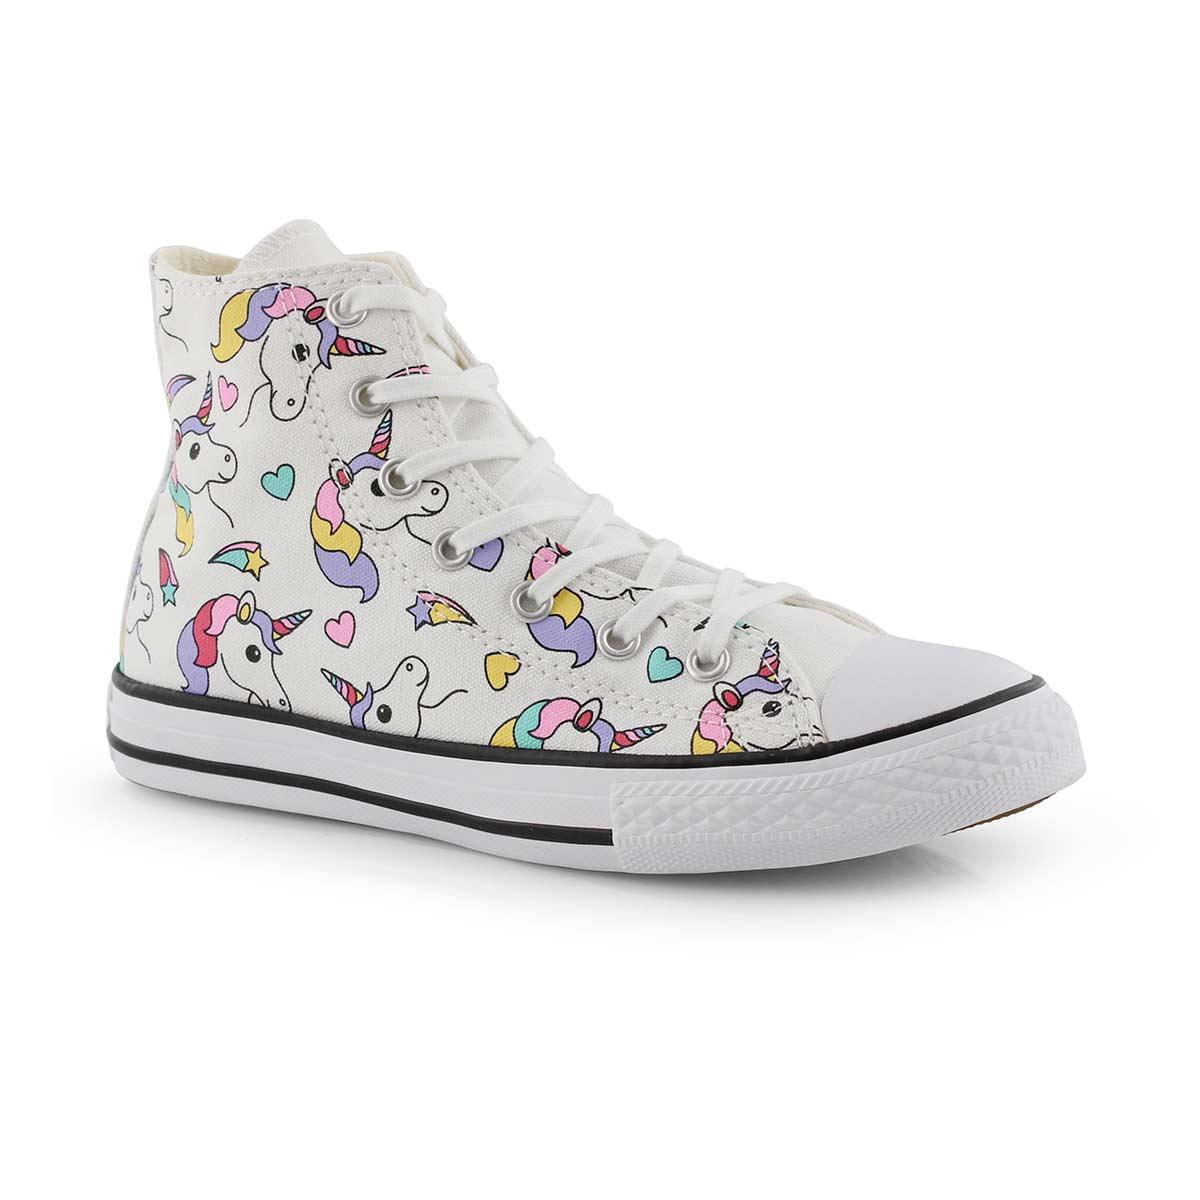 4d8b8325fda1 Converse Girls' Chuck Taylor All Star Unicorn Hi Top Sneaker   eBay